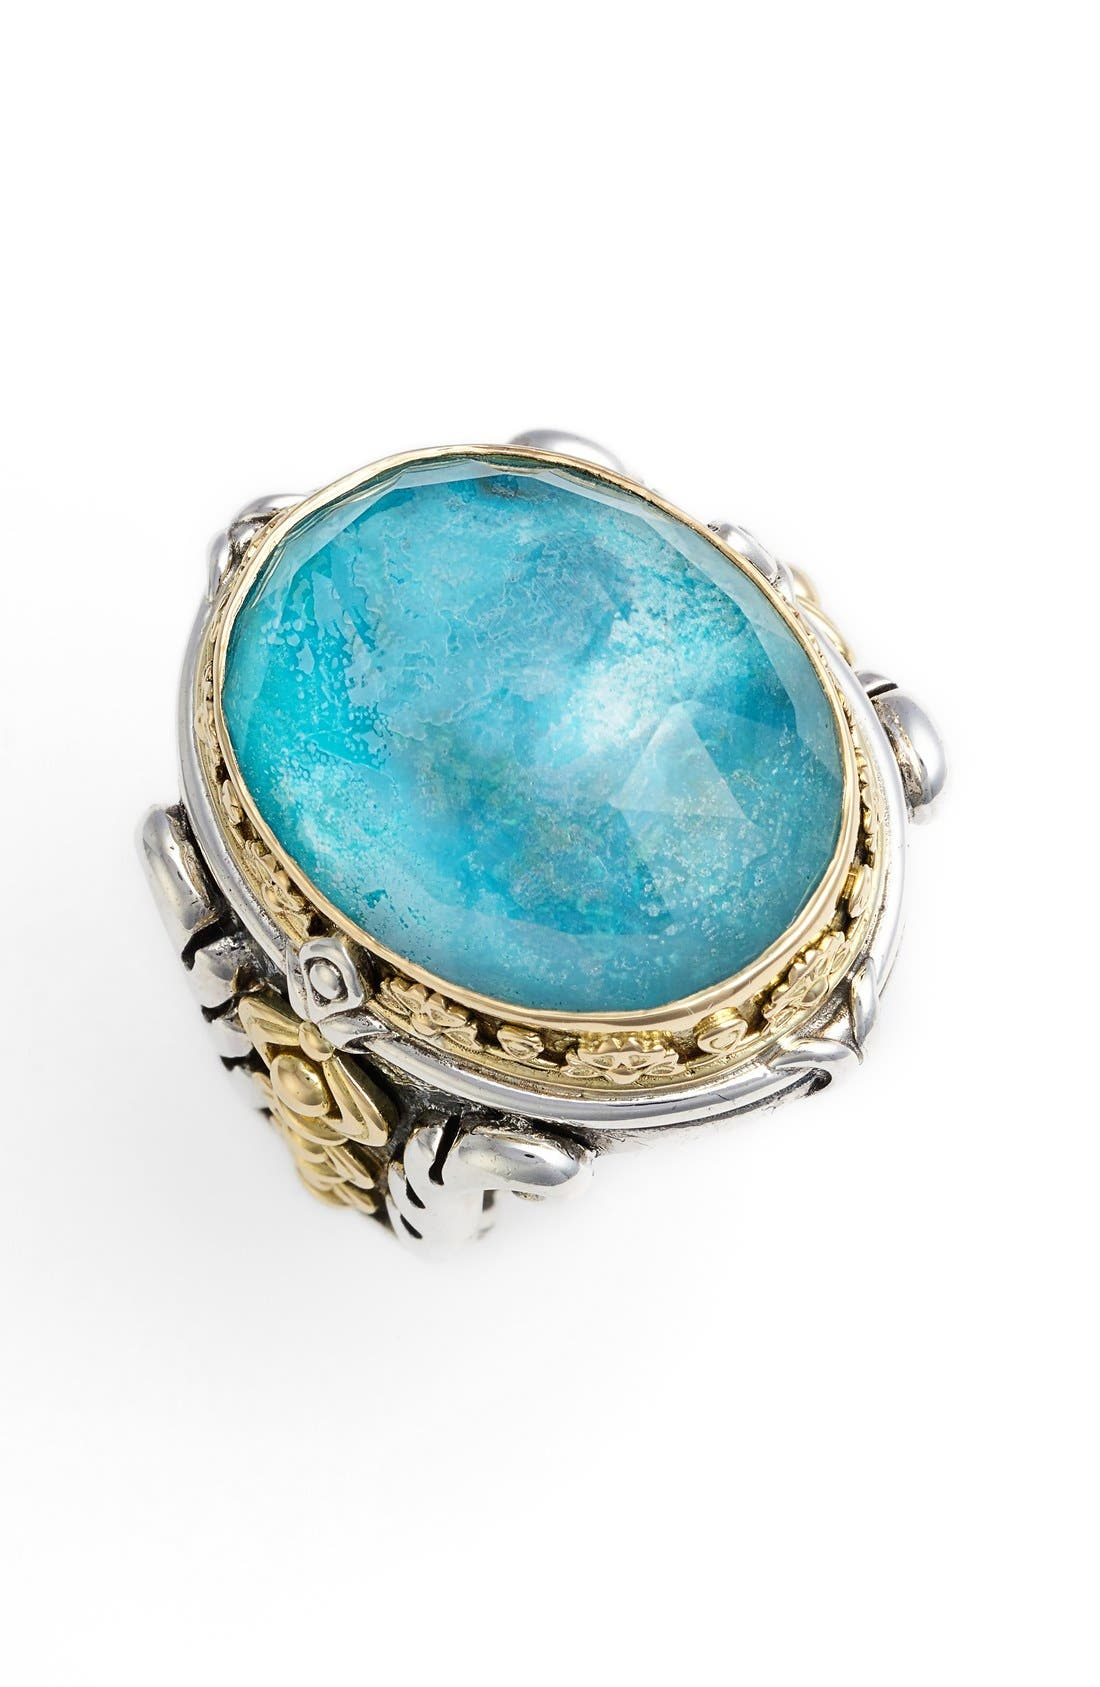 Konstantino 'Iliada' Large Oval Semiprecious Stone Ring